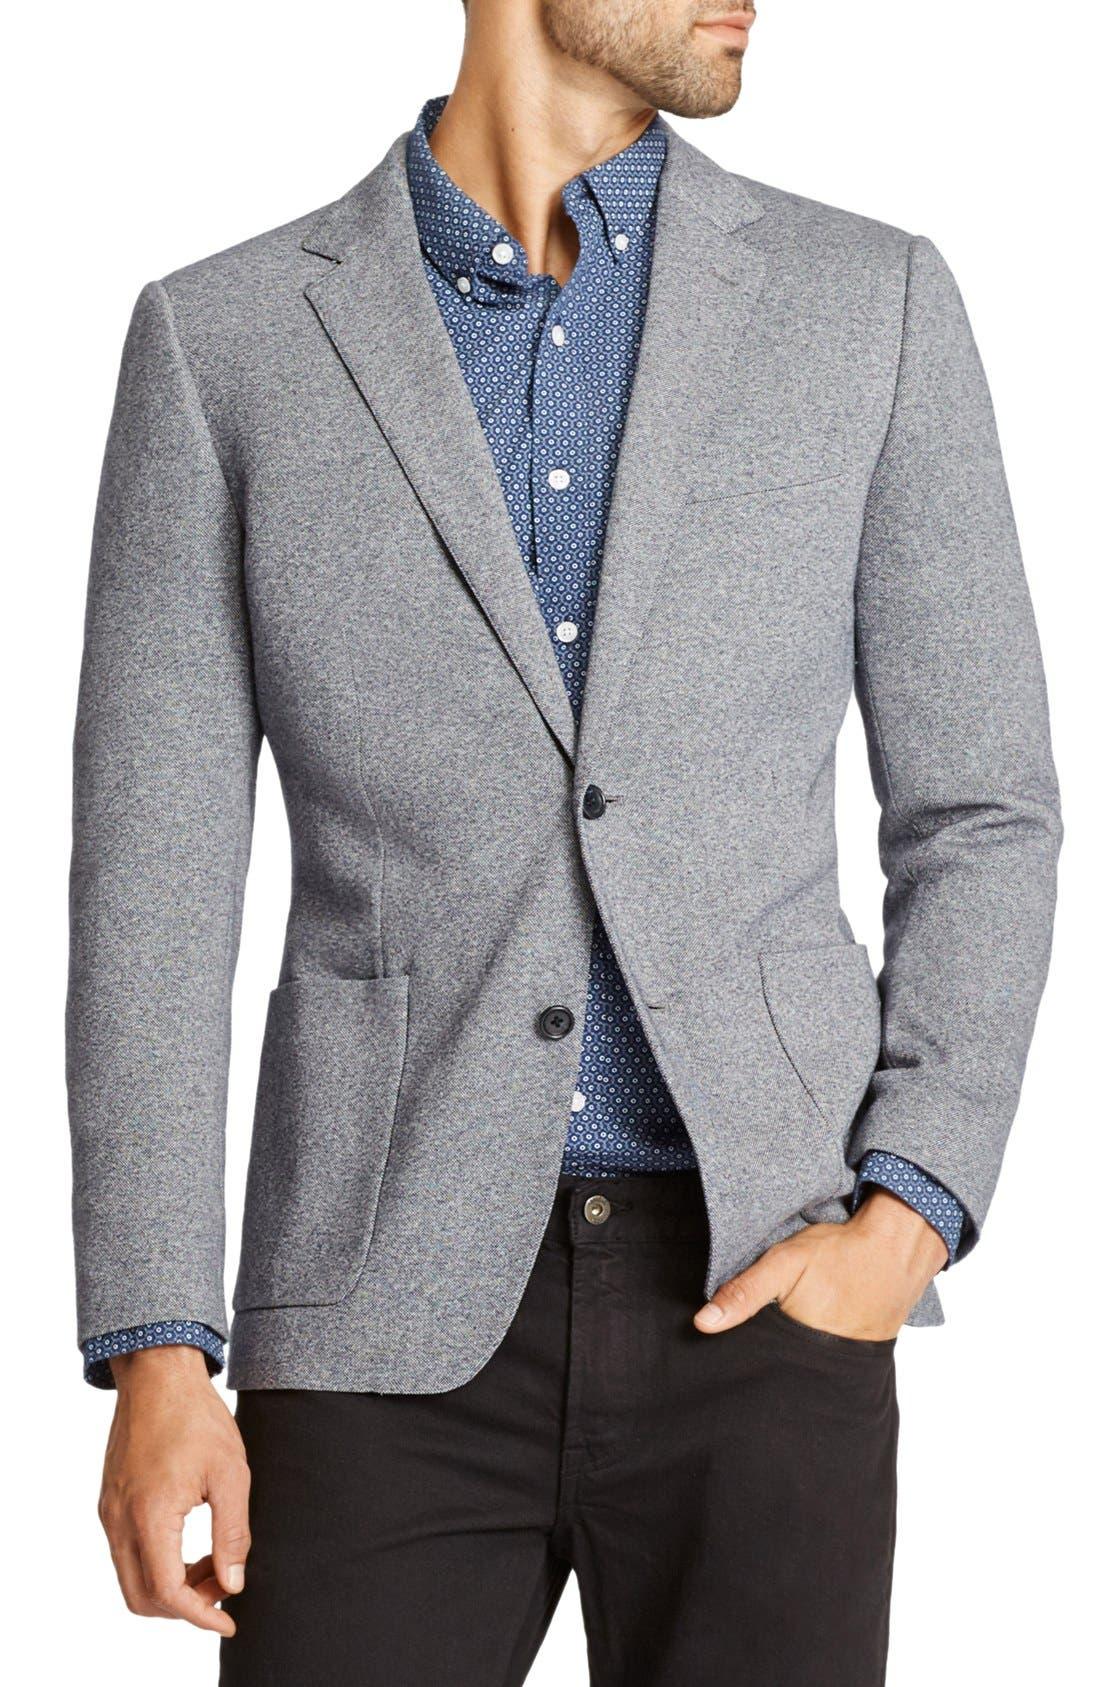 Jetsetter Trim Fit Knit Cotton Blazer,                         Main,                         color, Light Grey